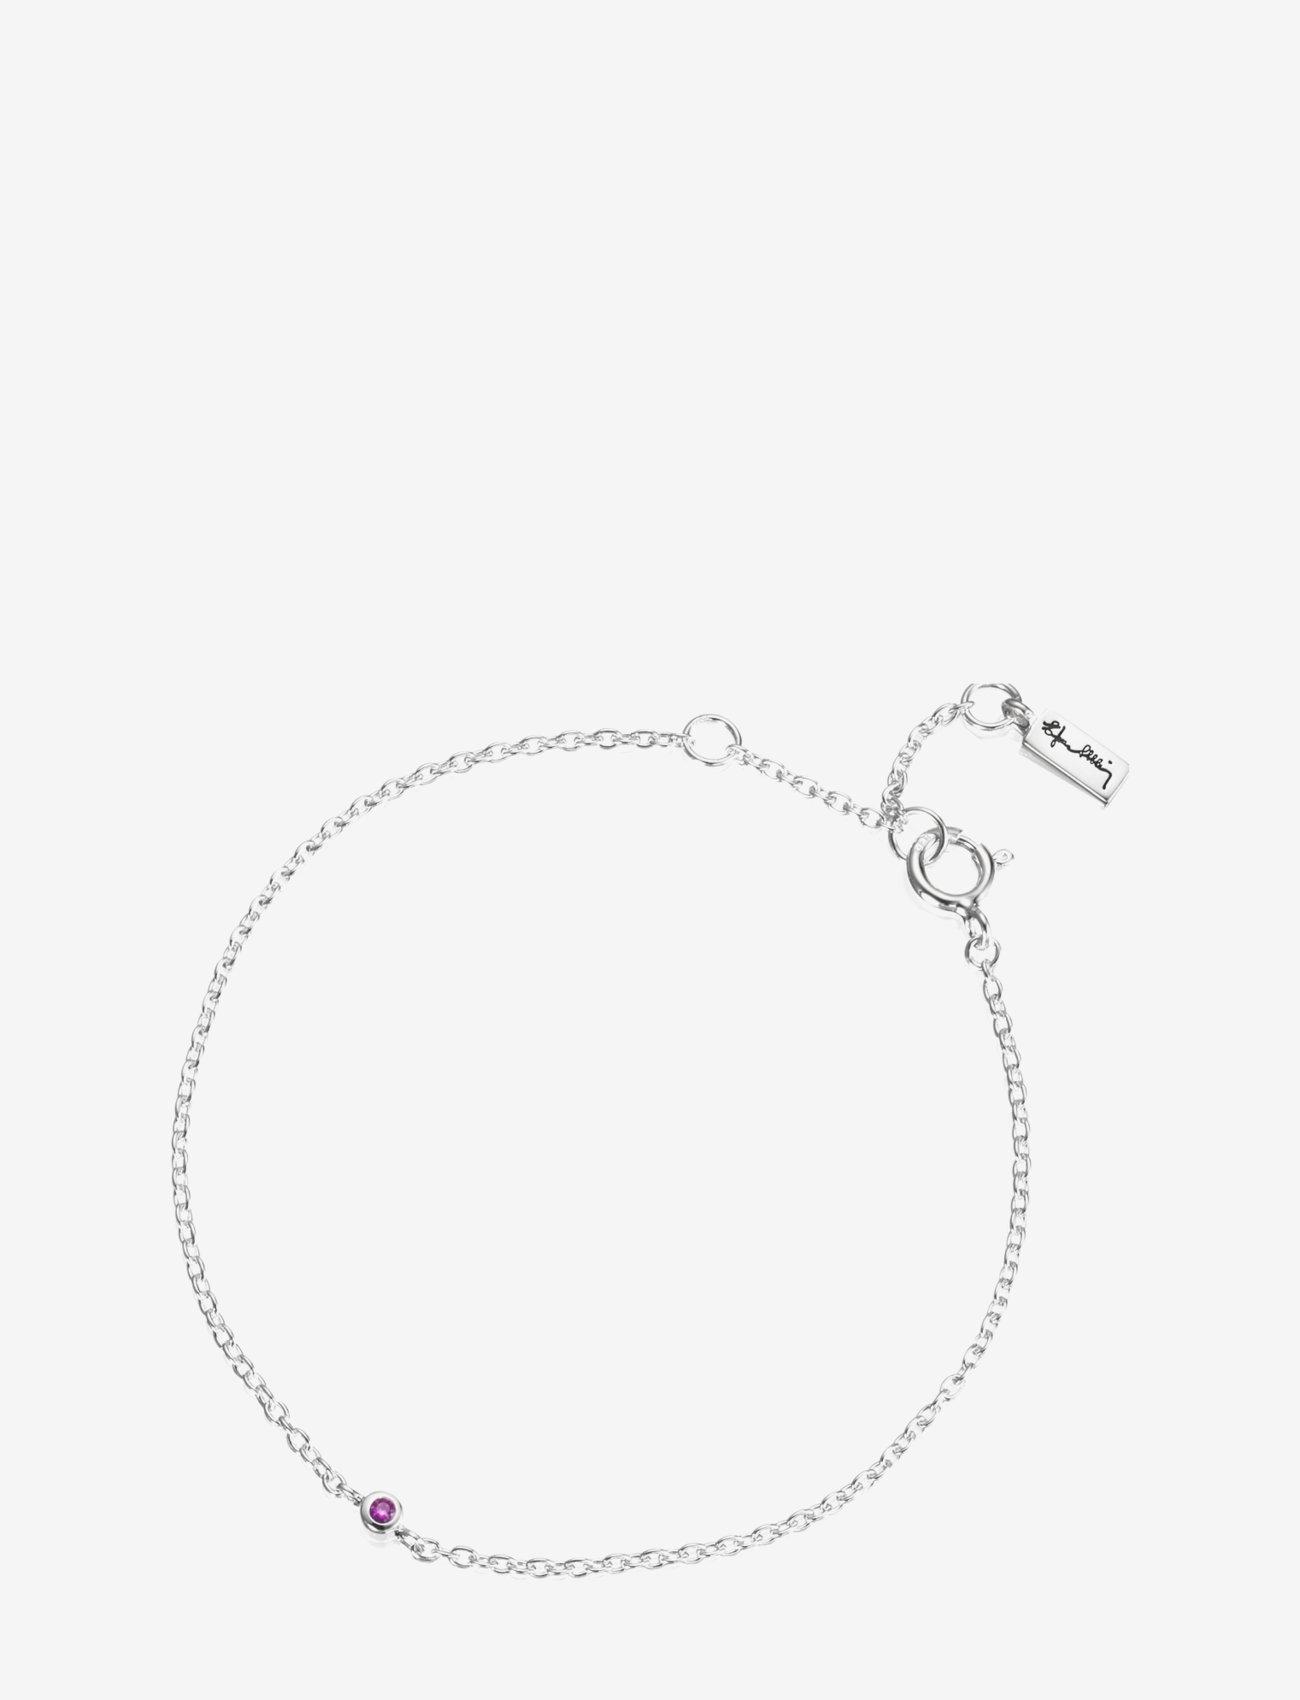 Efva Attling - Micro Blink Bracelet - Pink Sapphire - dainty - silver - 1